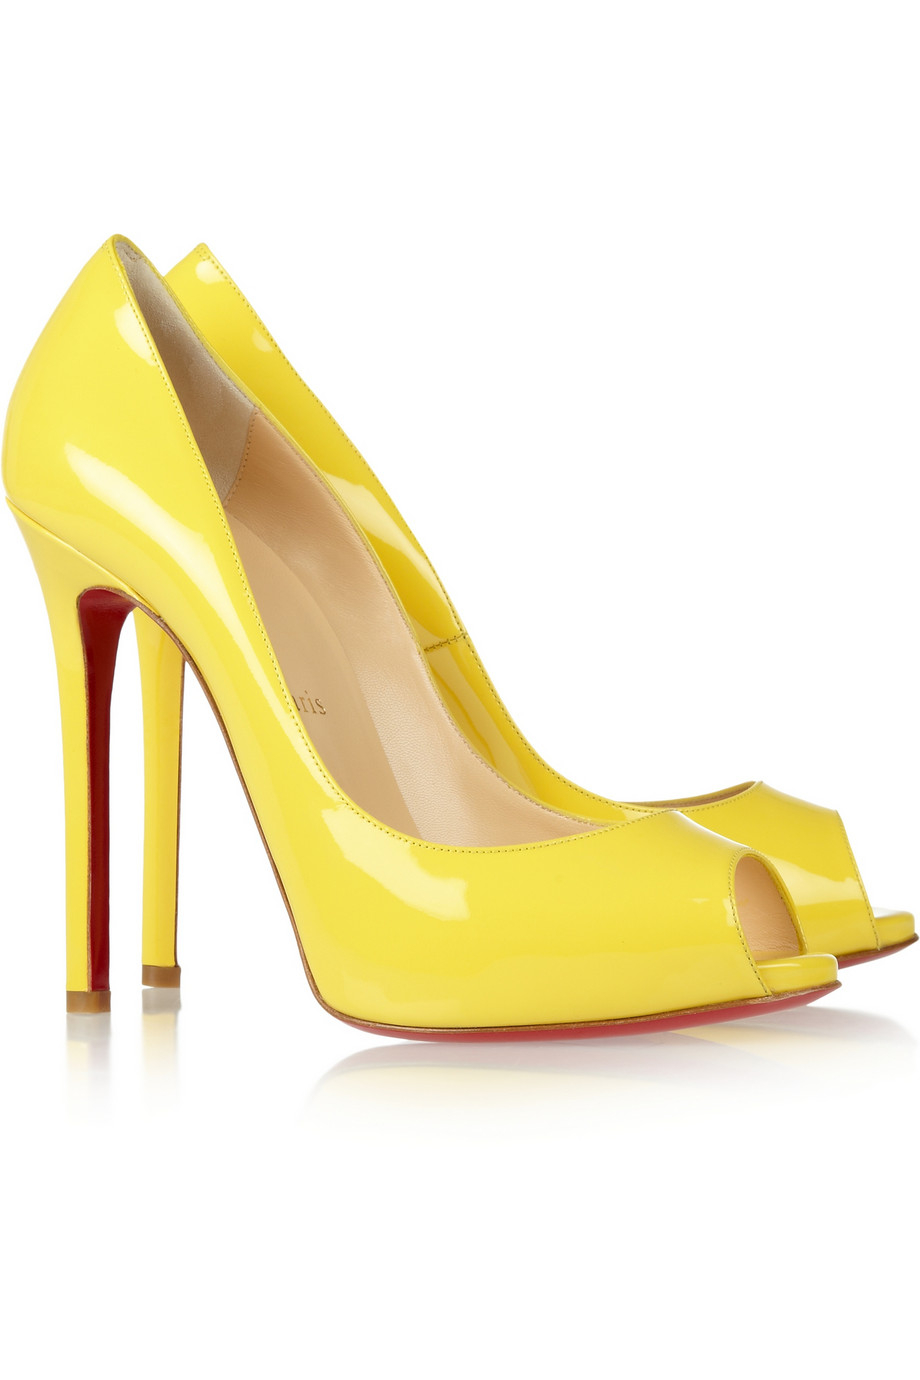 brand new ea3ce 61e0d Christian Louboutin Yellow Flo 120 Patentleather Peeptoe Pumps